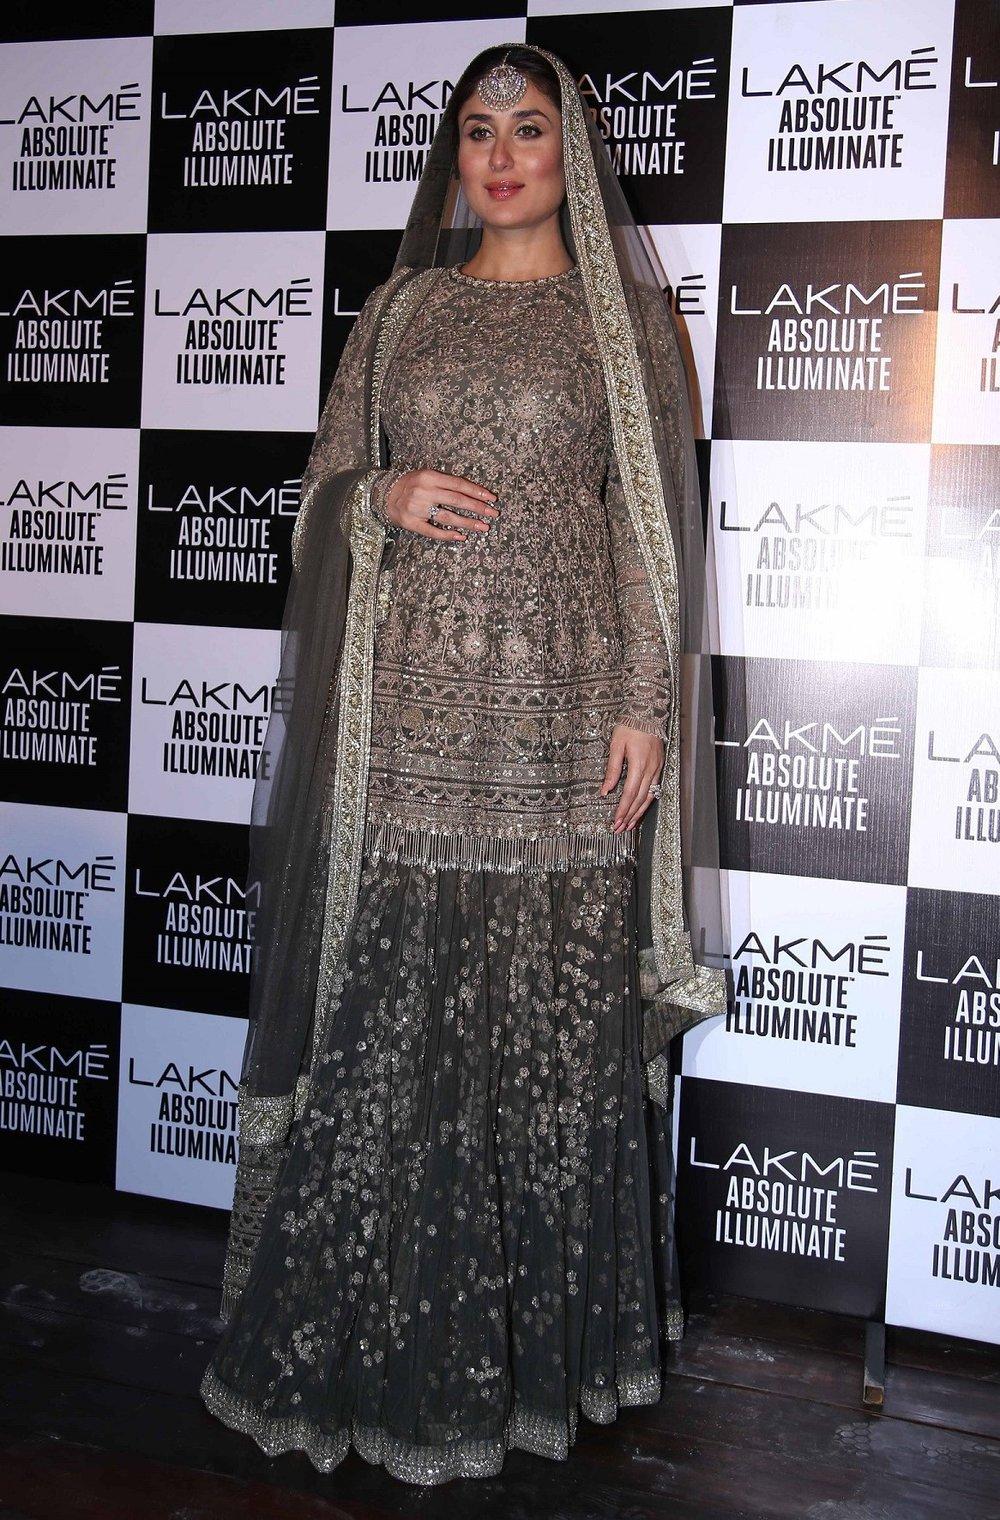 Lakme Absolute Brand Ambassador Kareena Kapoor Khan at the Lakme Absolute Grand Finale Winter Festive 2016 2 (2).jpg